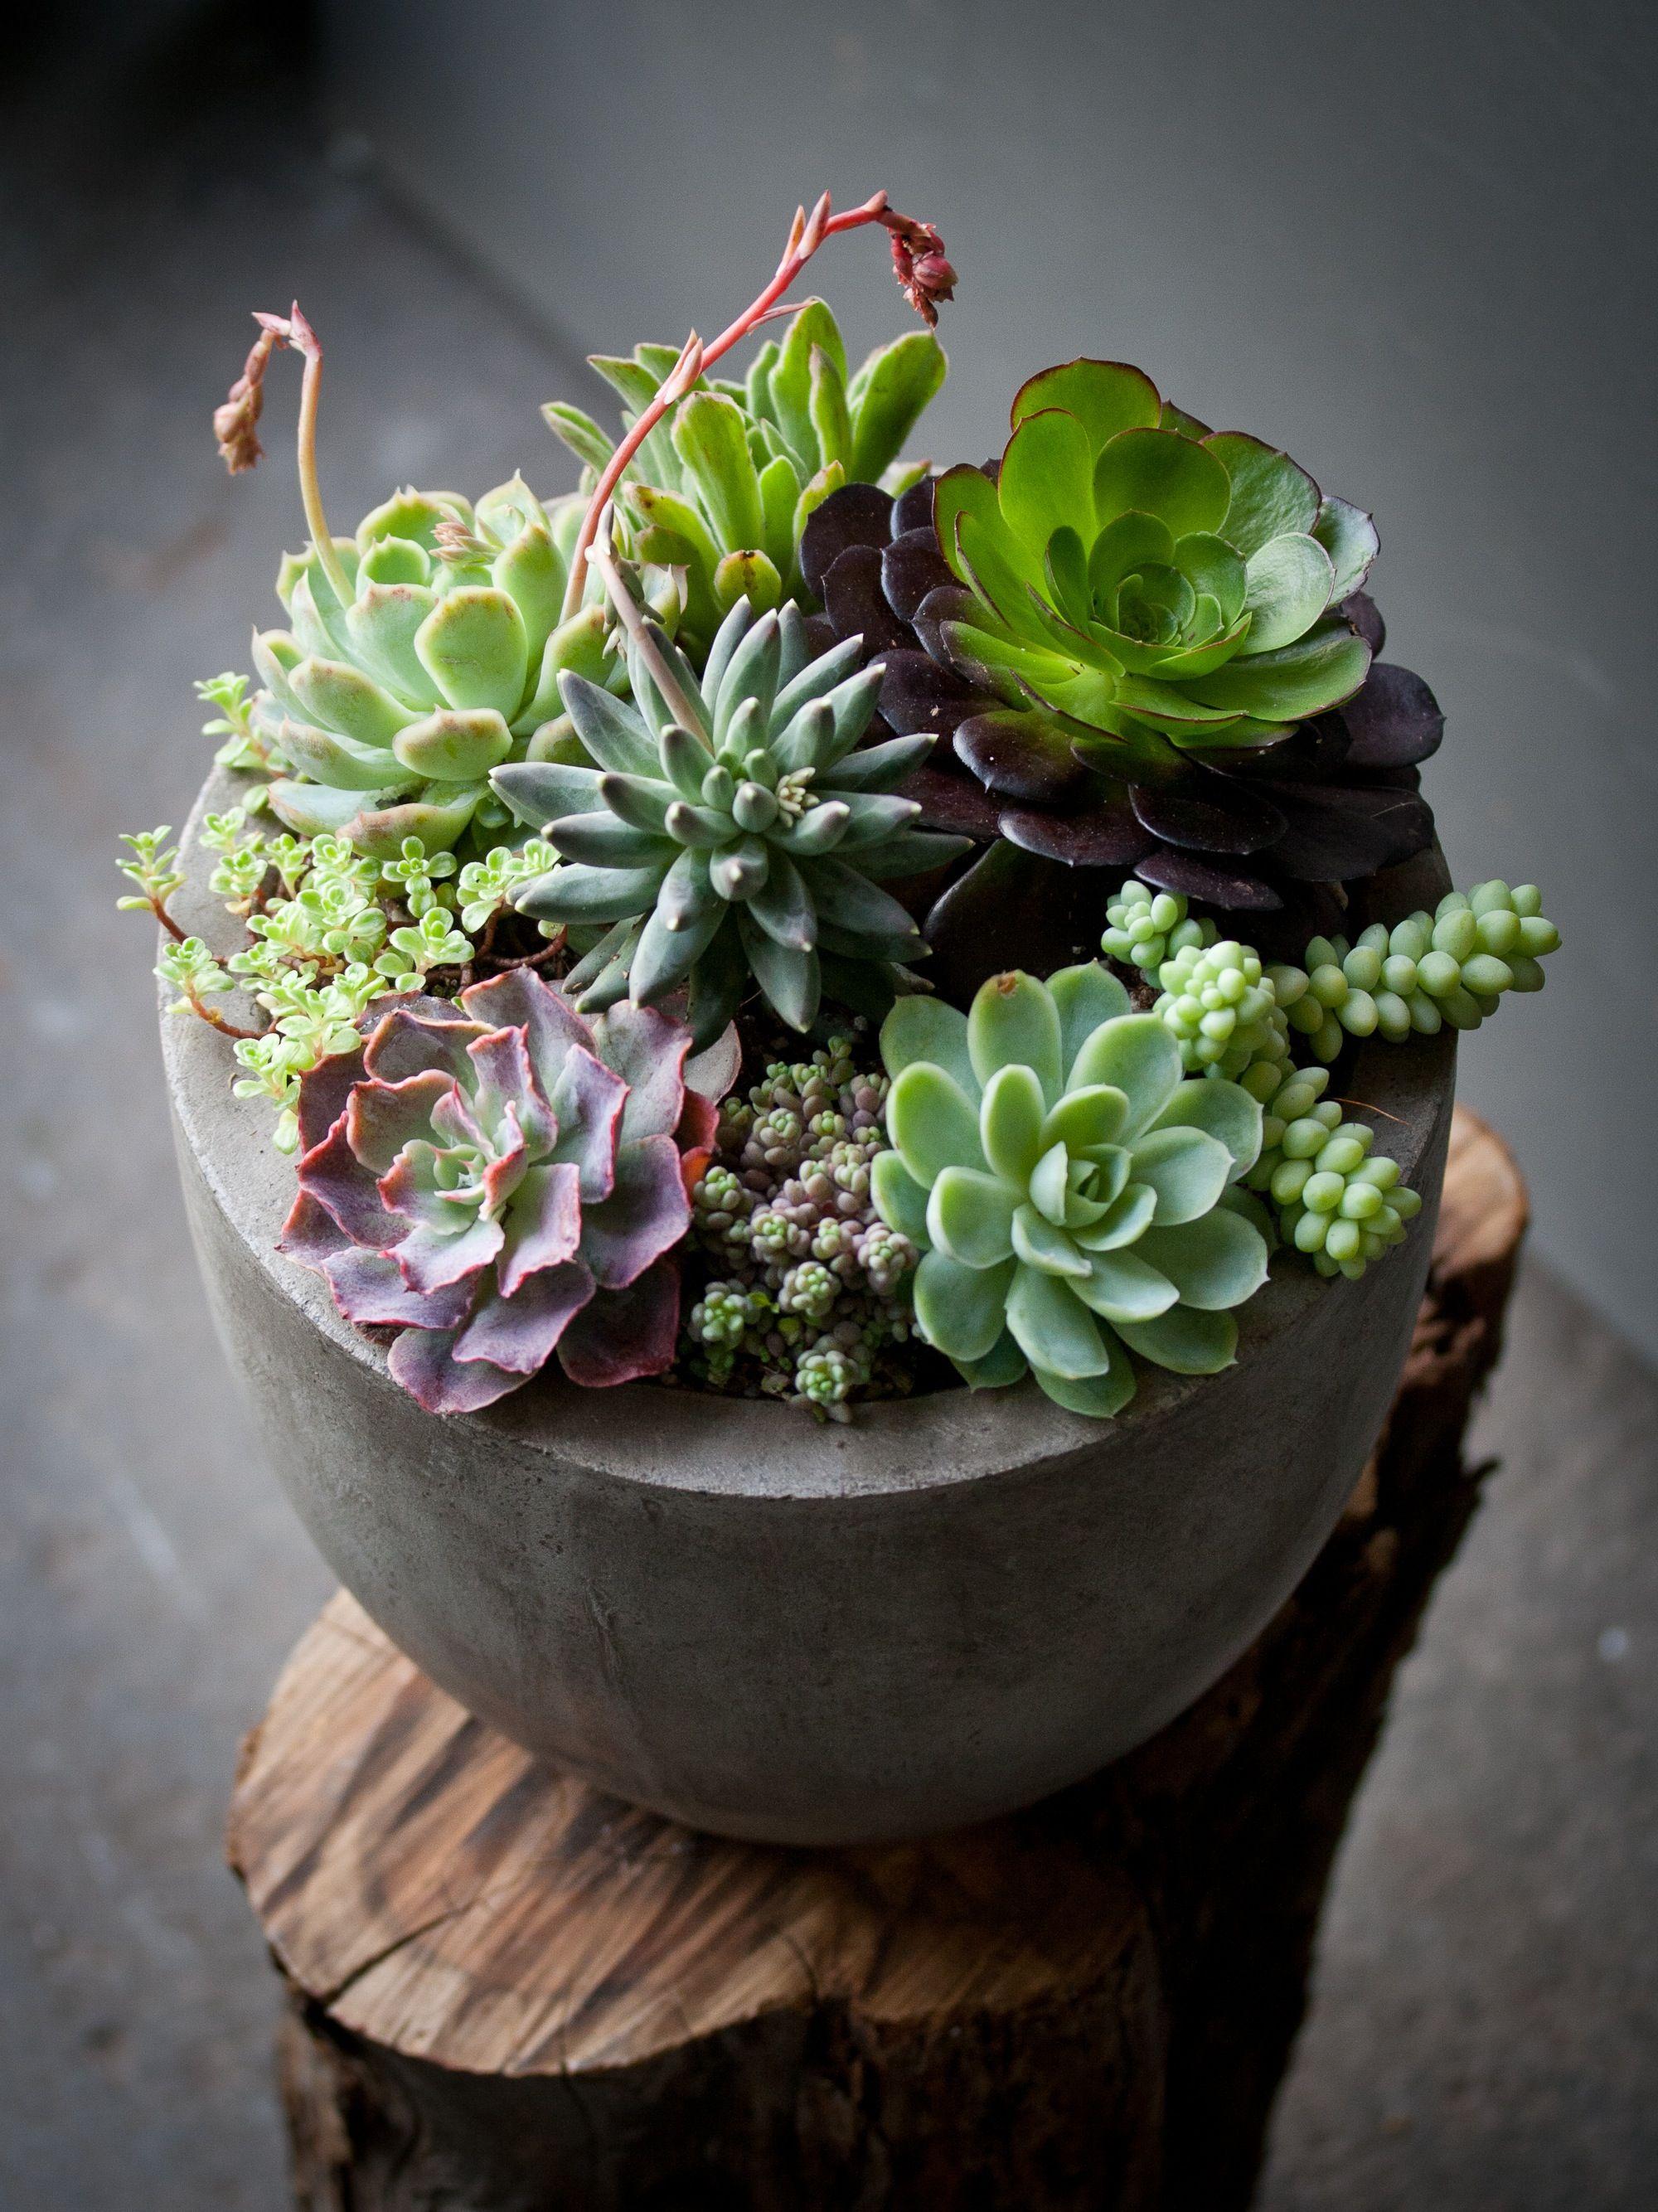 35 Awesome Succulents Garden Ideas Succulent Garden Indoor